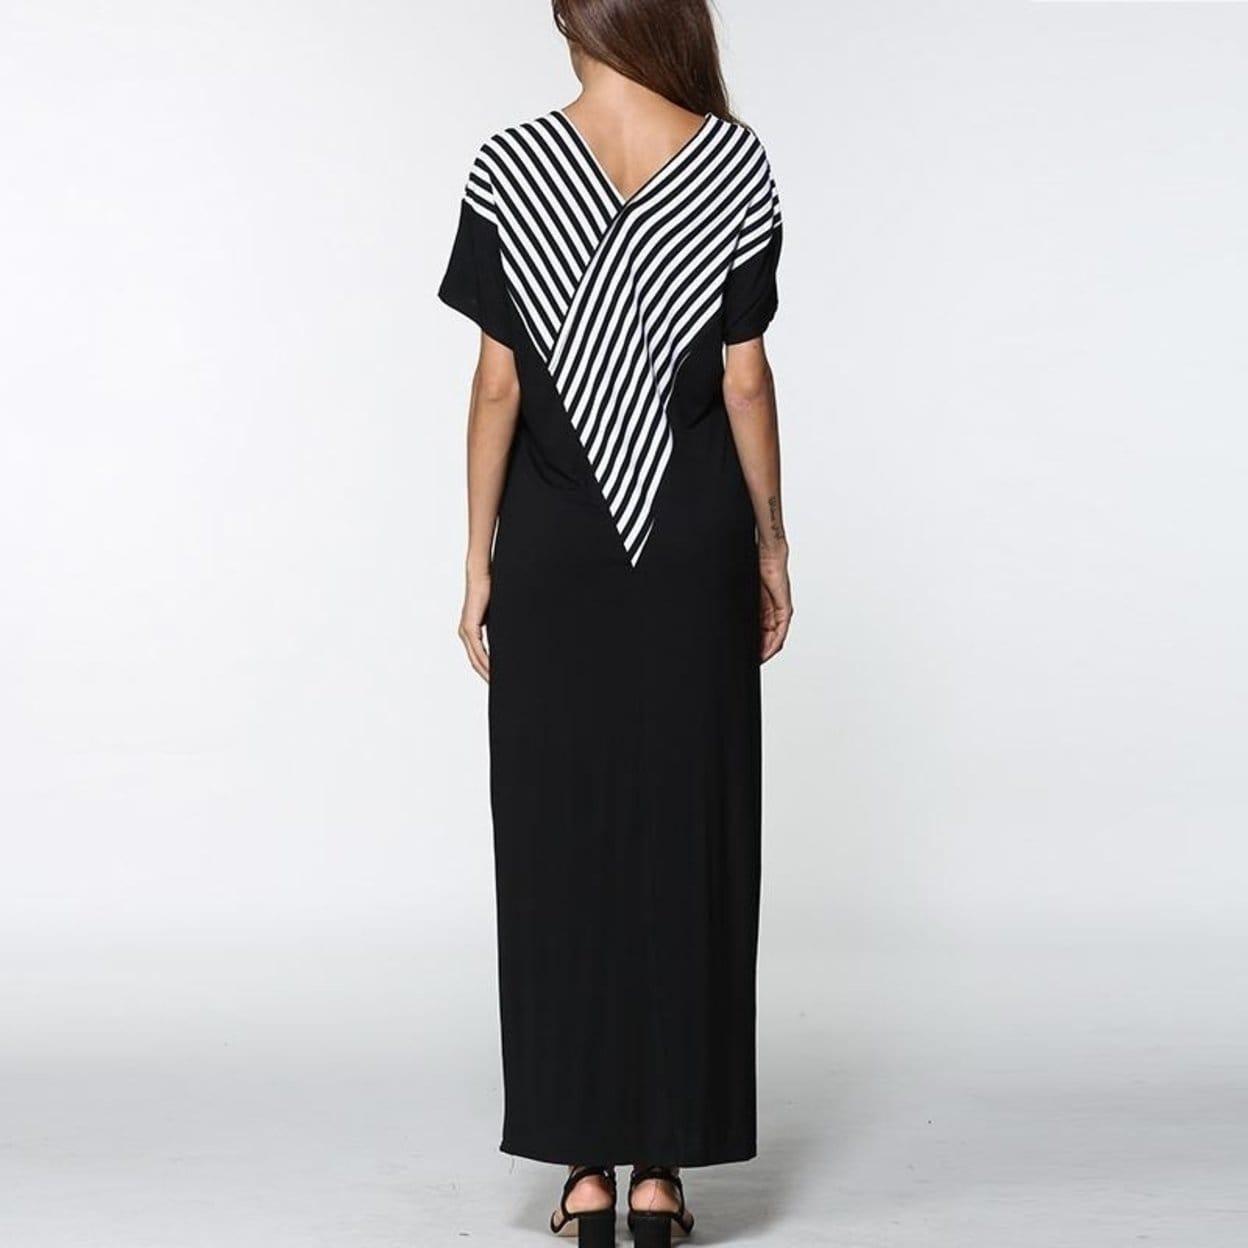 c04df7a55b2 Shop Tigena Loose Striped Summer Dress Women 2018 Floor Length Dresses Big  Sizes Long Maxi Dress Summer Sundress Robe Femme - Free Shipping Today ...